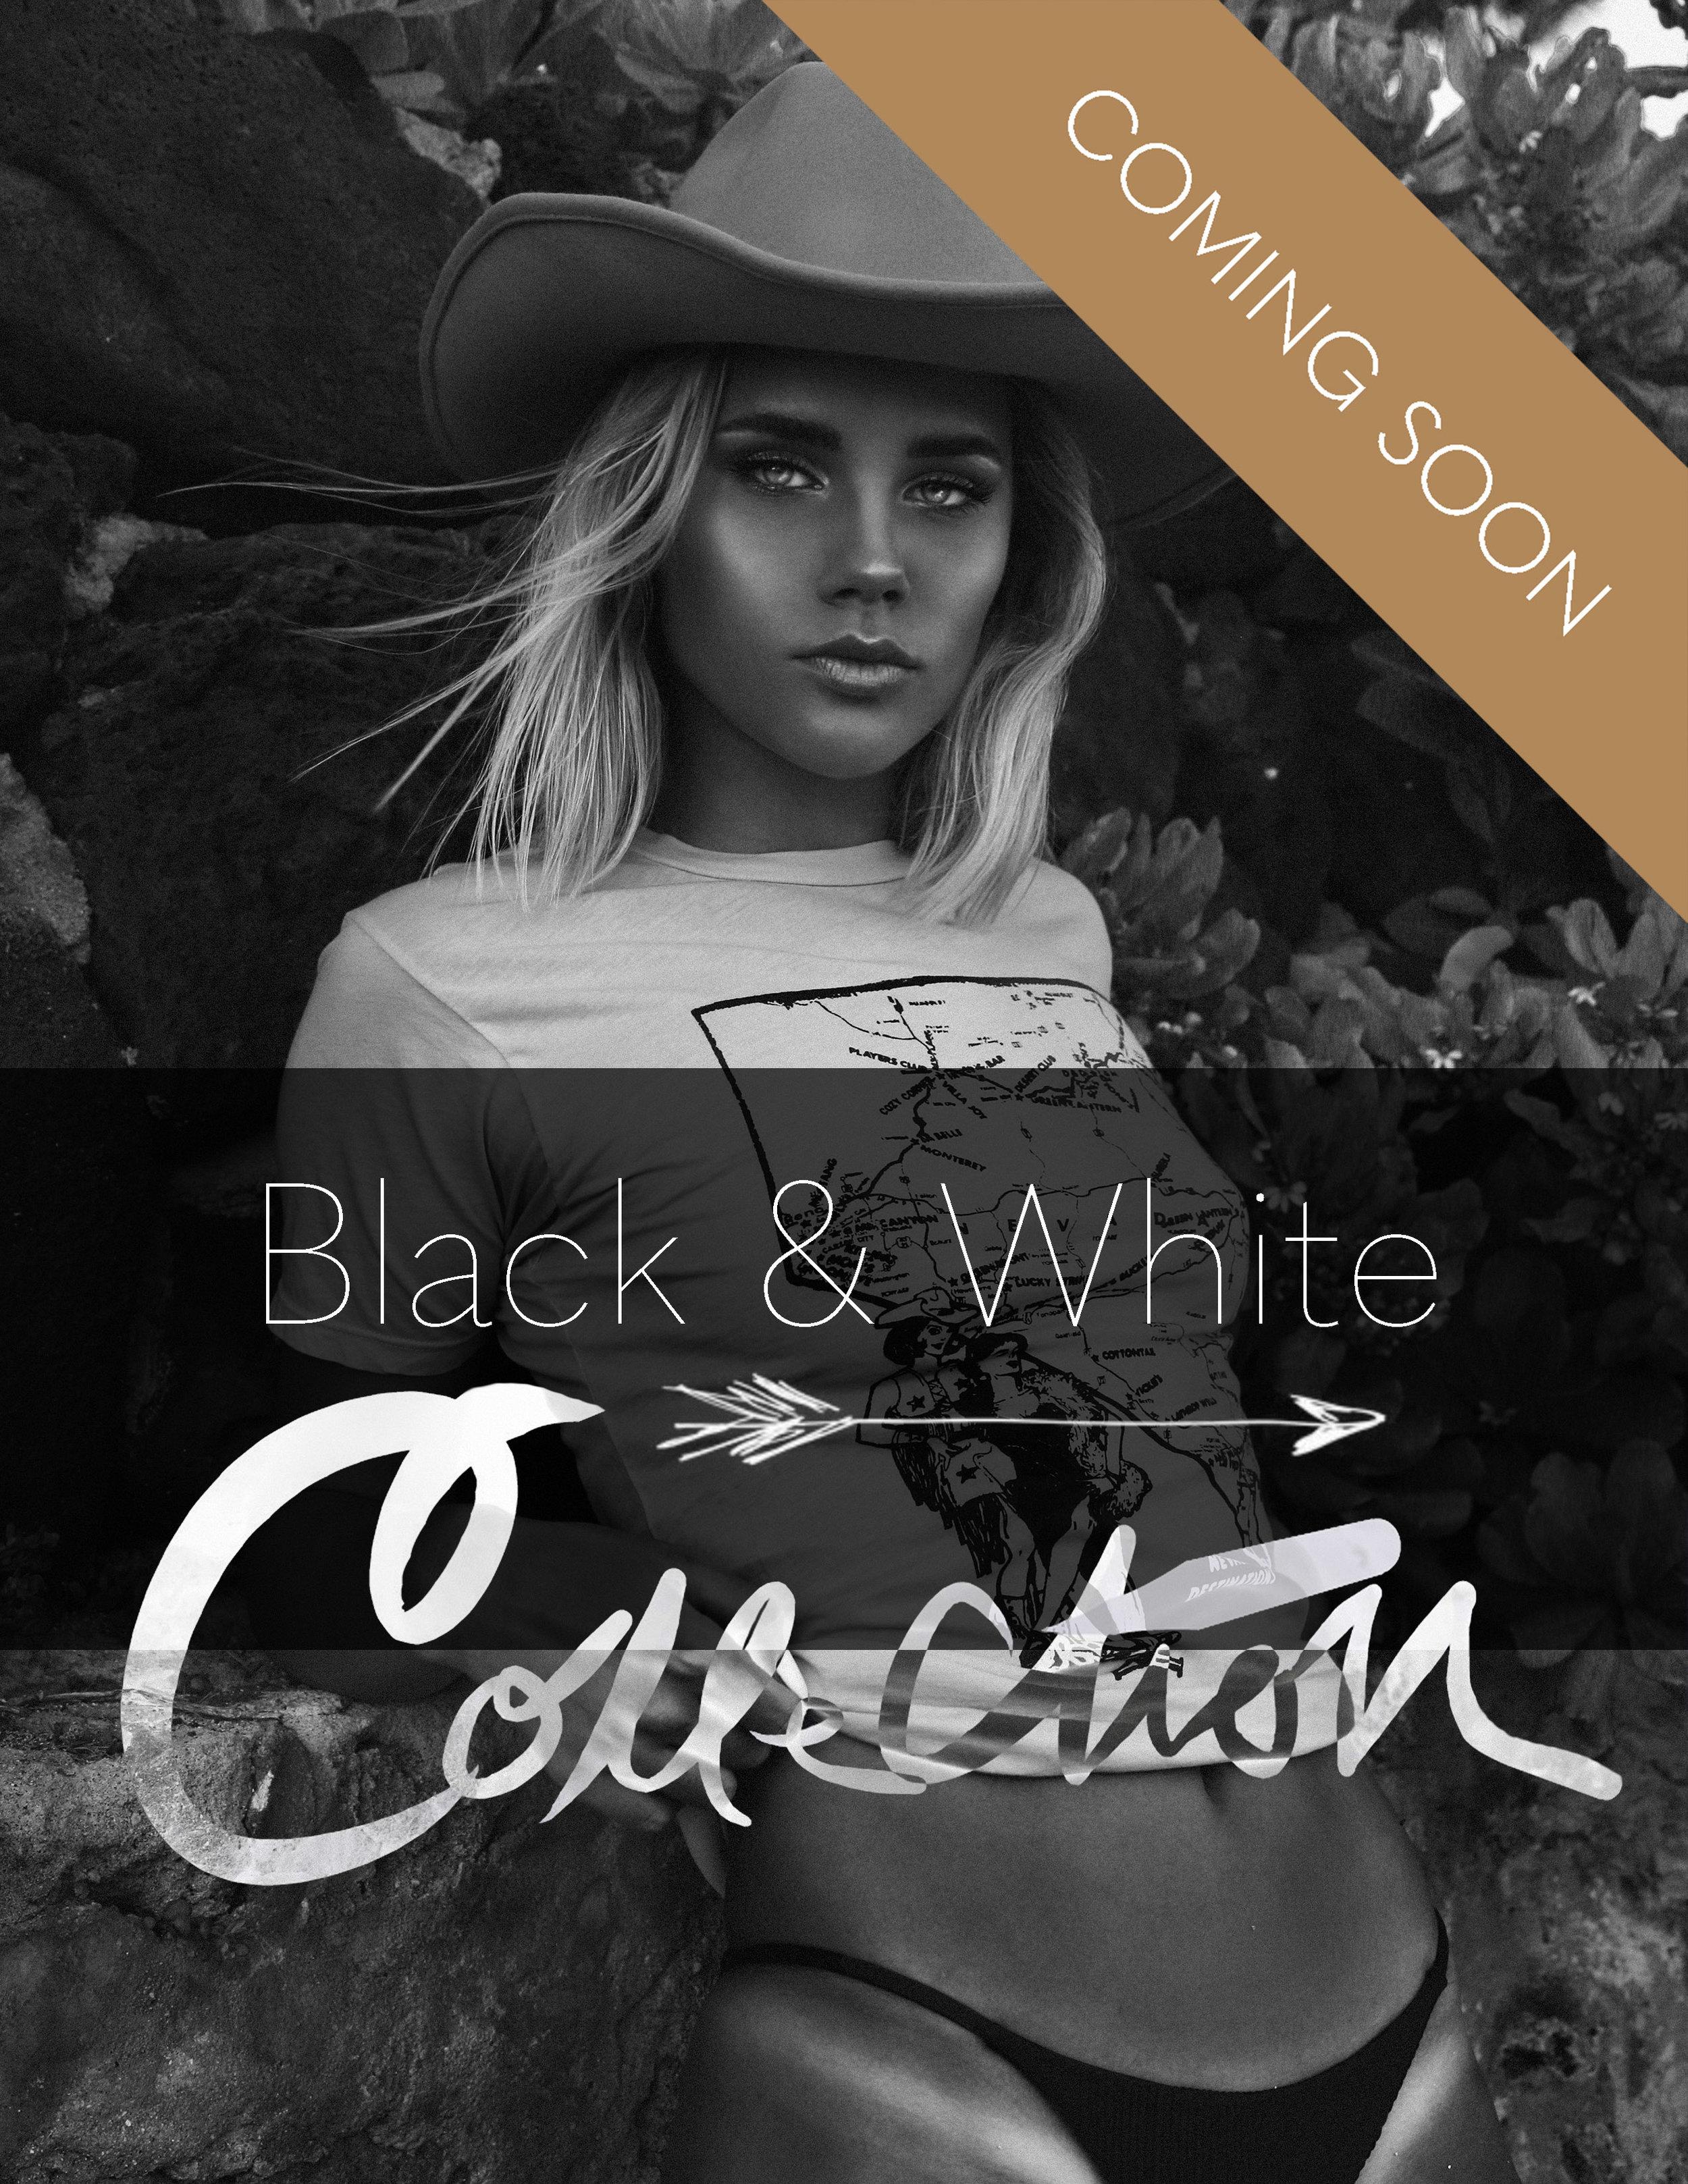 Black and White Collection Photoshop Actions - SHOP Photographer Alyssa Risley @alyssarisley